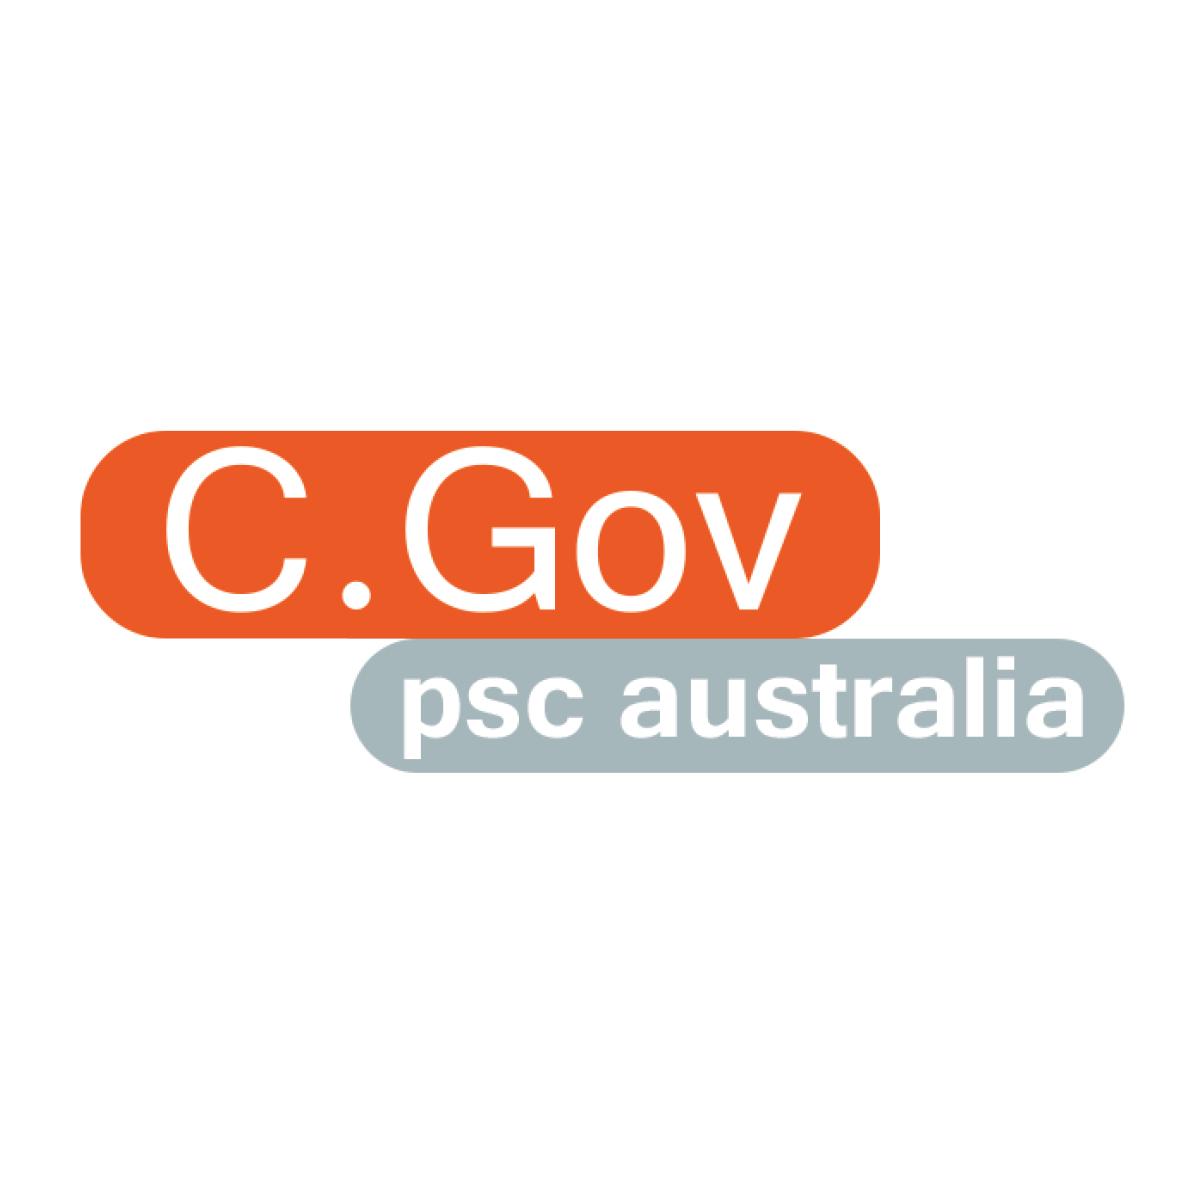 CGov Australia